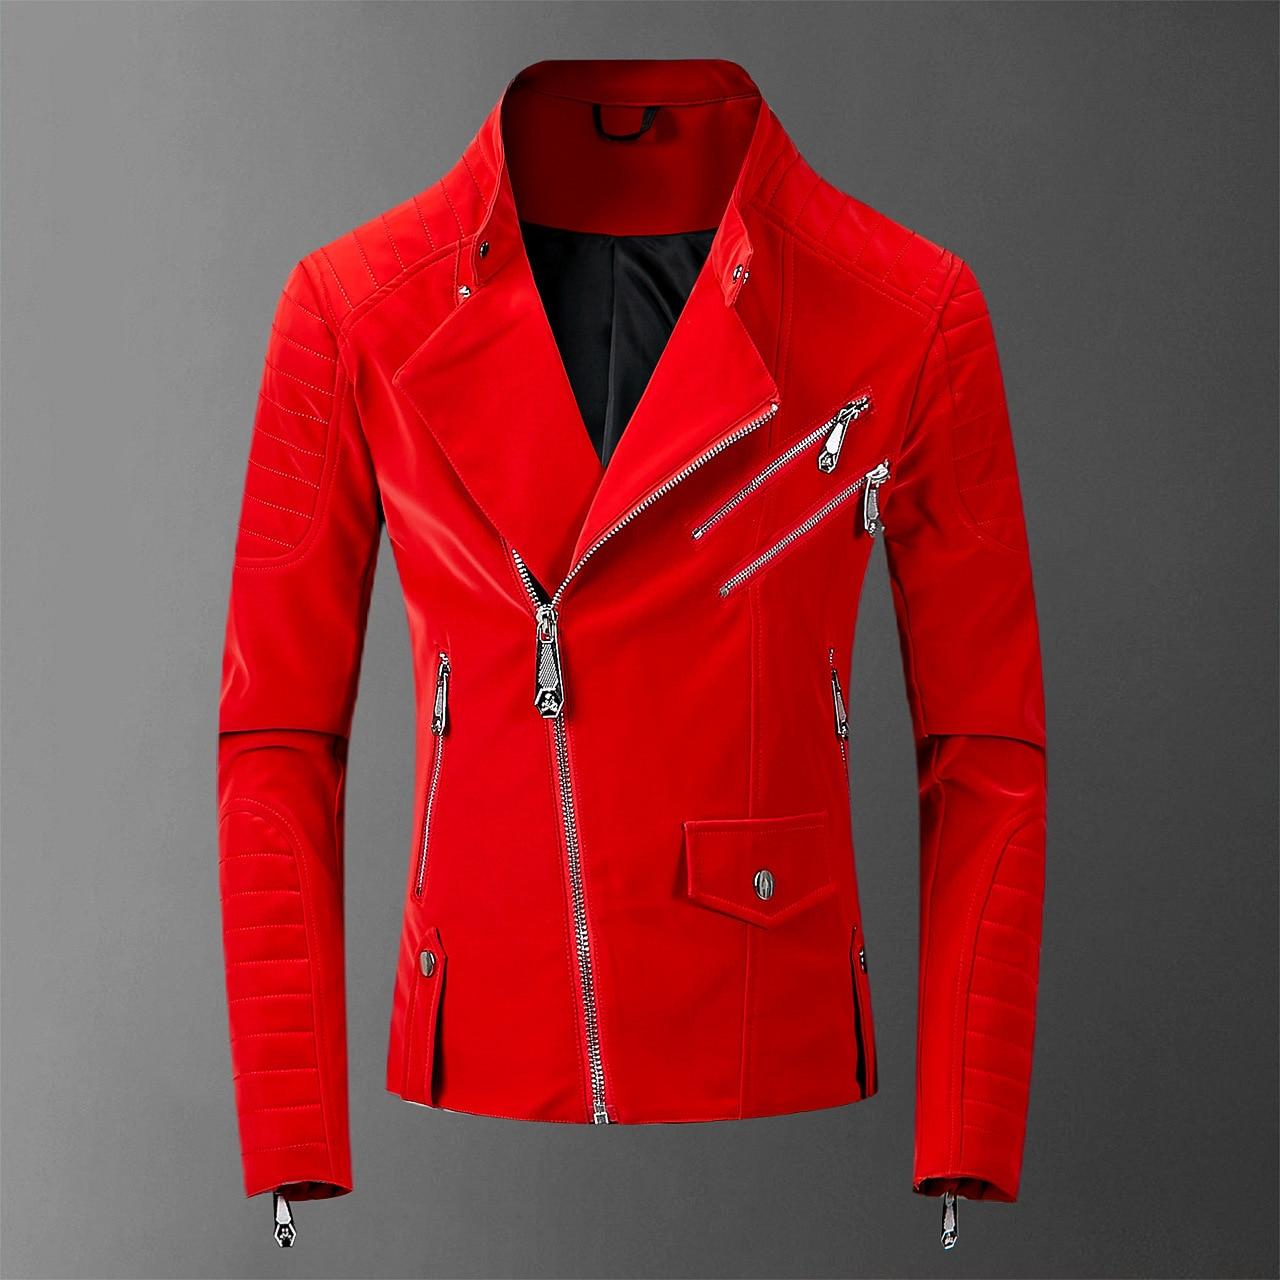 Zipper Winter Biker 2021 Leather Jackets Men Hiphop Streetwear Mens Jackets Faux Leather Coats Casacas Para Hombre PU jackt